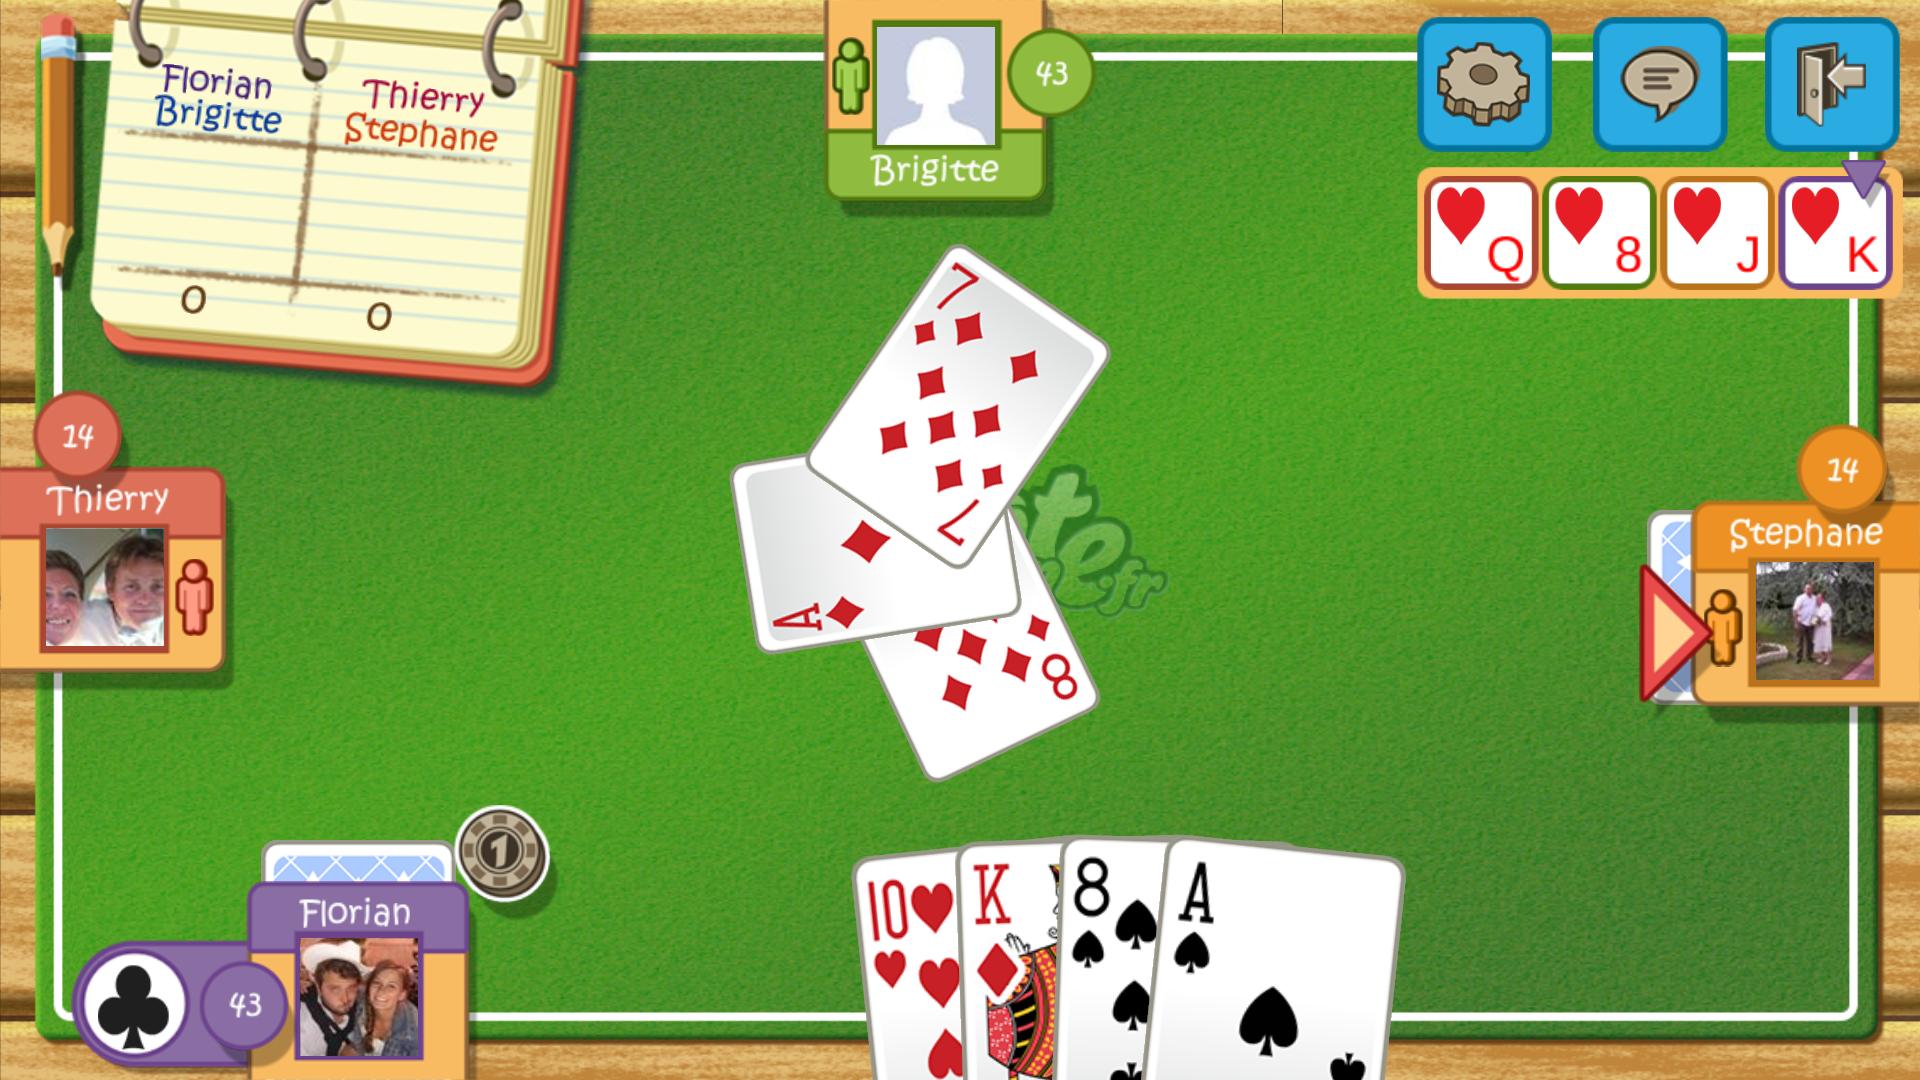 jeu de carte a deux belote en ligne gratuit. Black Bedroom Furniture Sets. Home Design Ideas